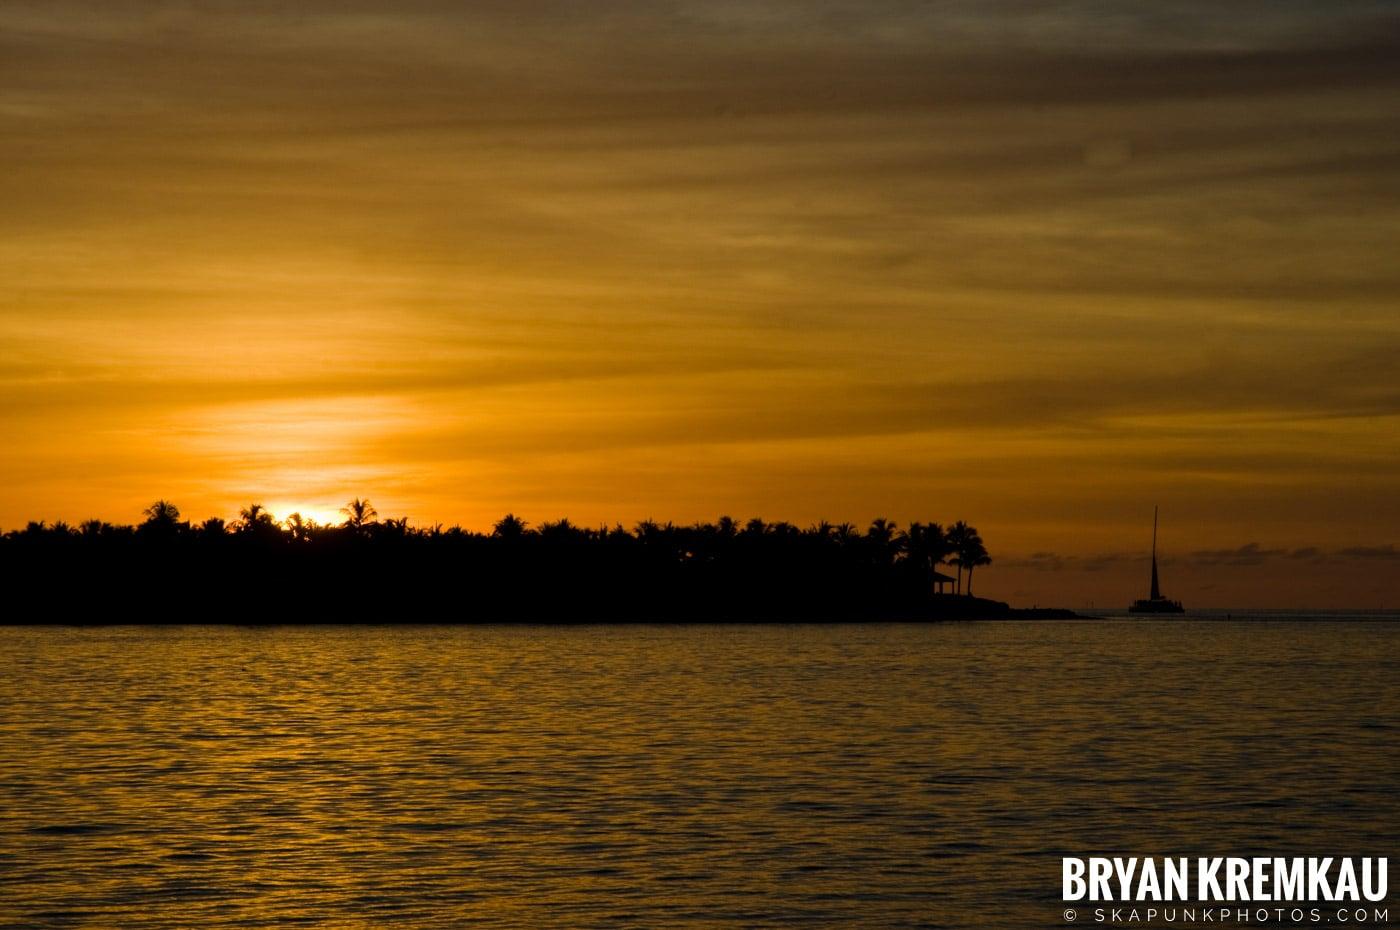 Florida Keys Vacation - 7.09.10 - 7.15.10 (19)